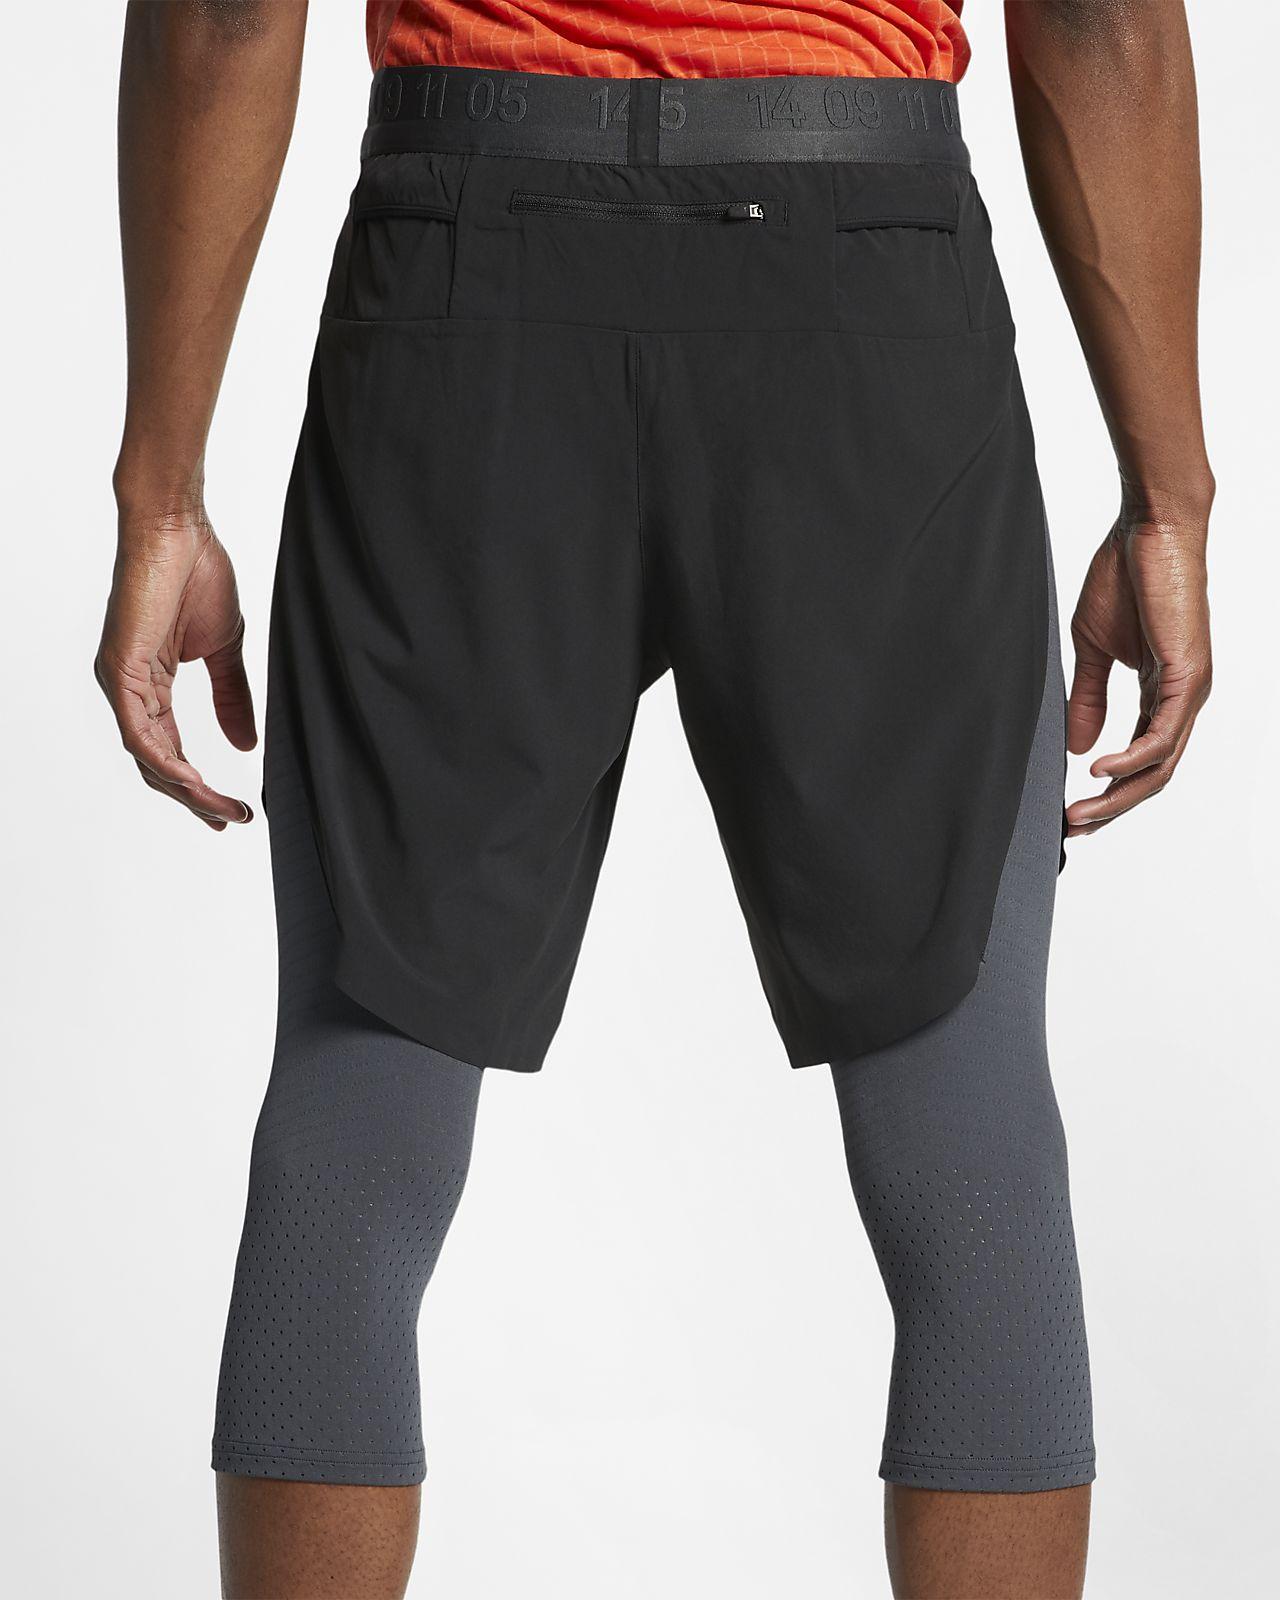 nike shorts 3 pack